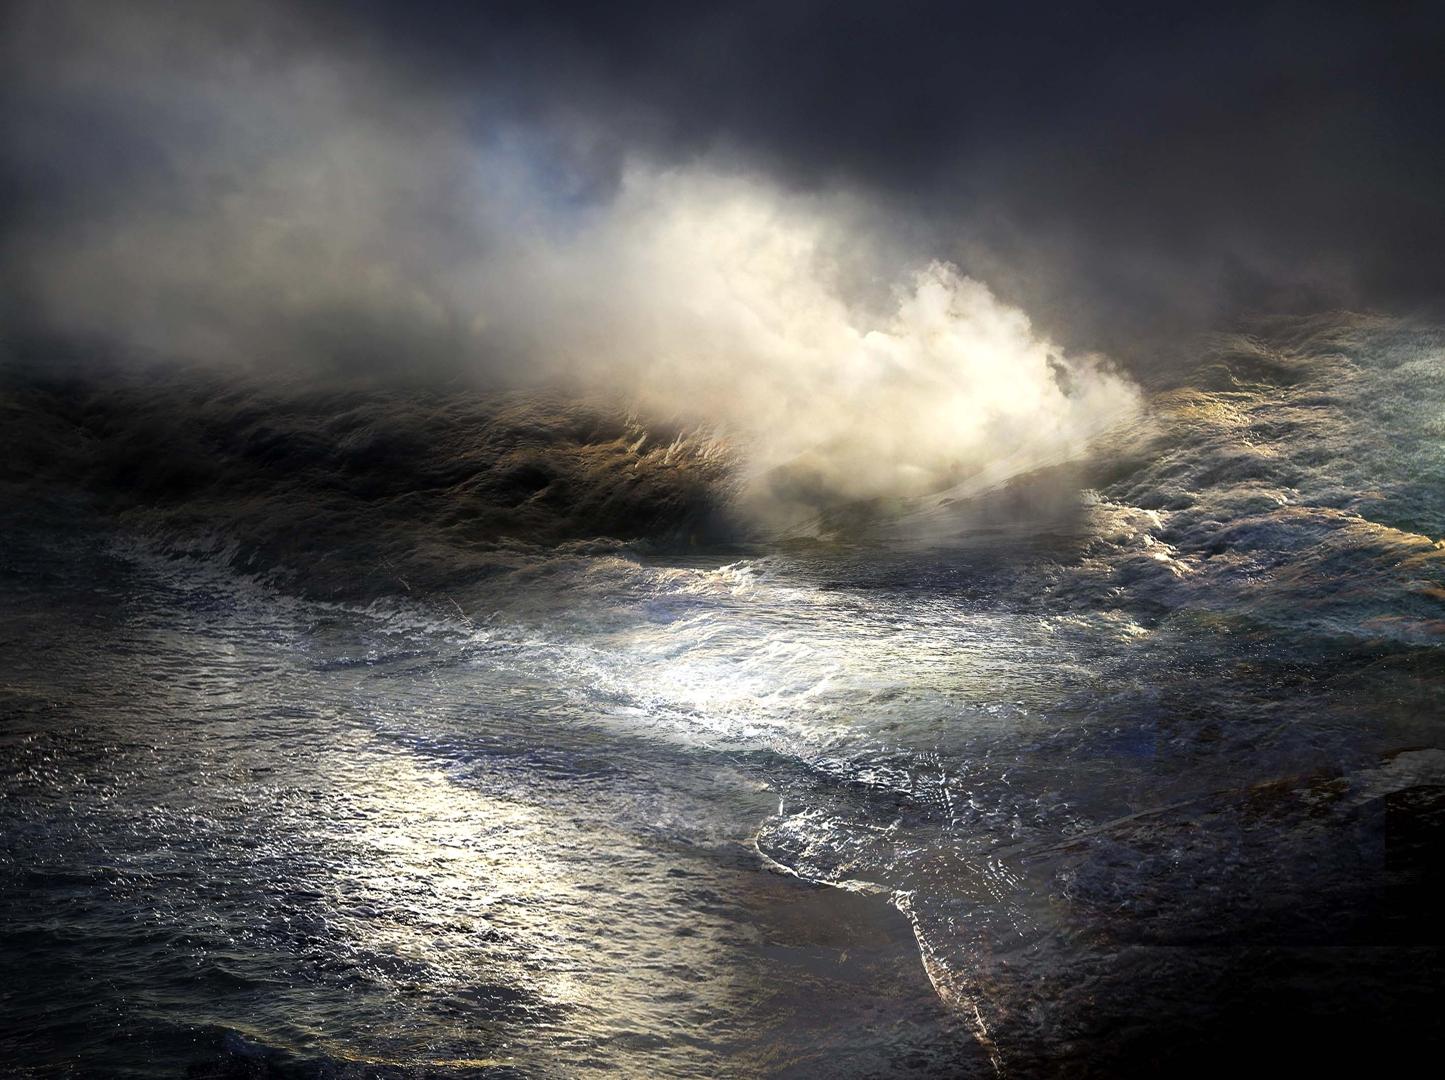 Rebekah Stuart, The Good Waters, 2015, archival inkjet print on cotton rag, 115 x 86.35cm image